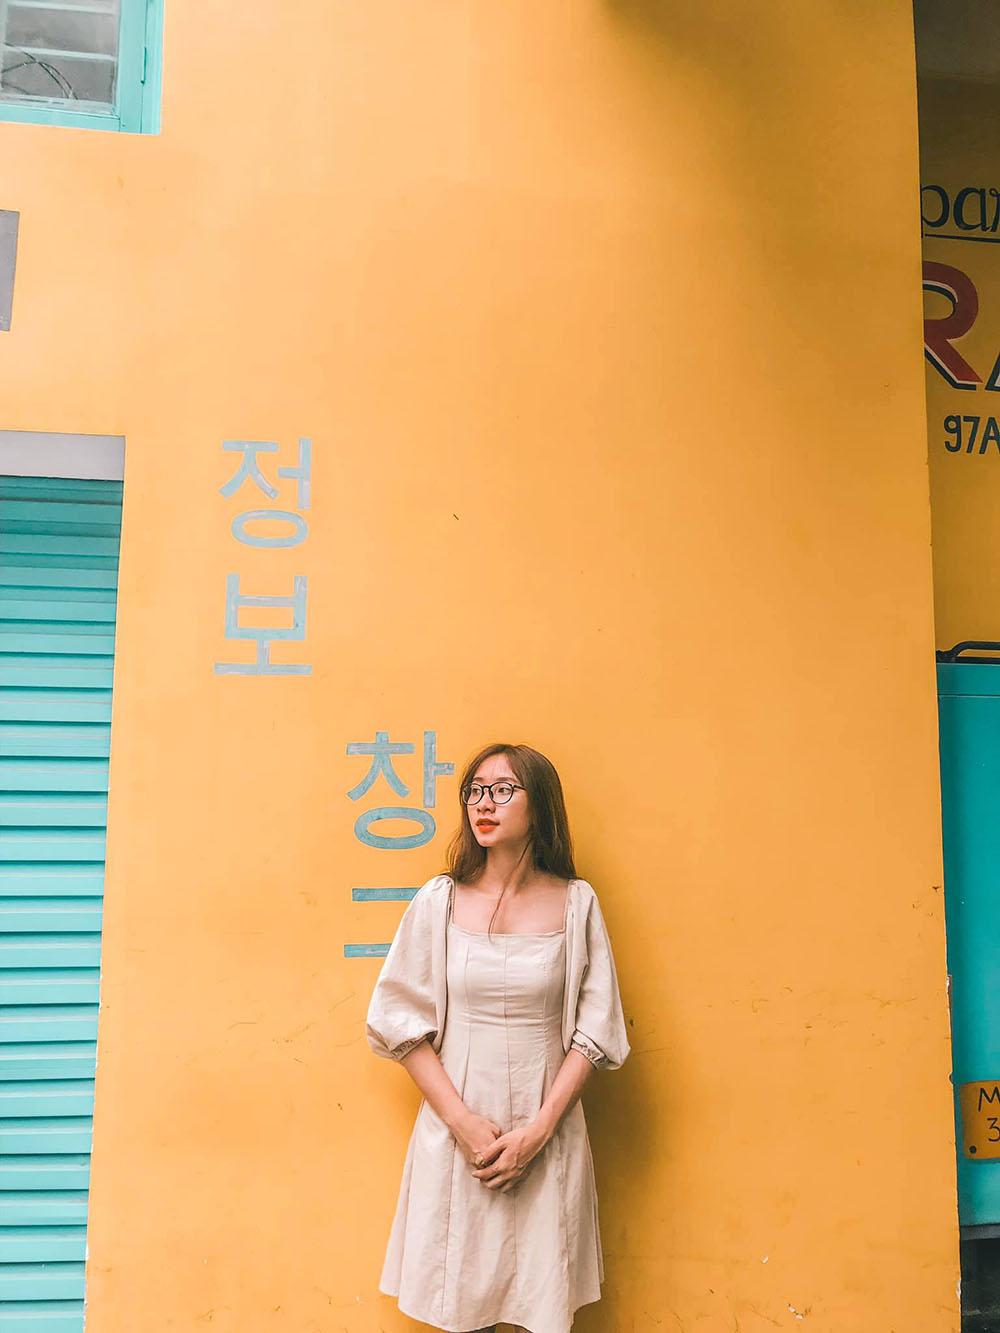 Raon Hotel 97a Hoang Bich Son Review Chuyen Du Lich Hoi An Da Nang Cua 02 Co Ban Than 07